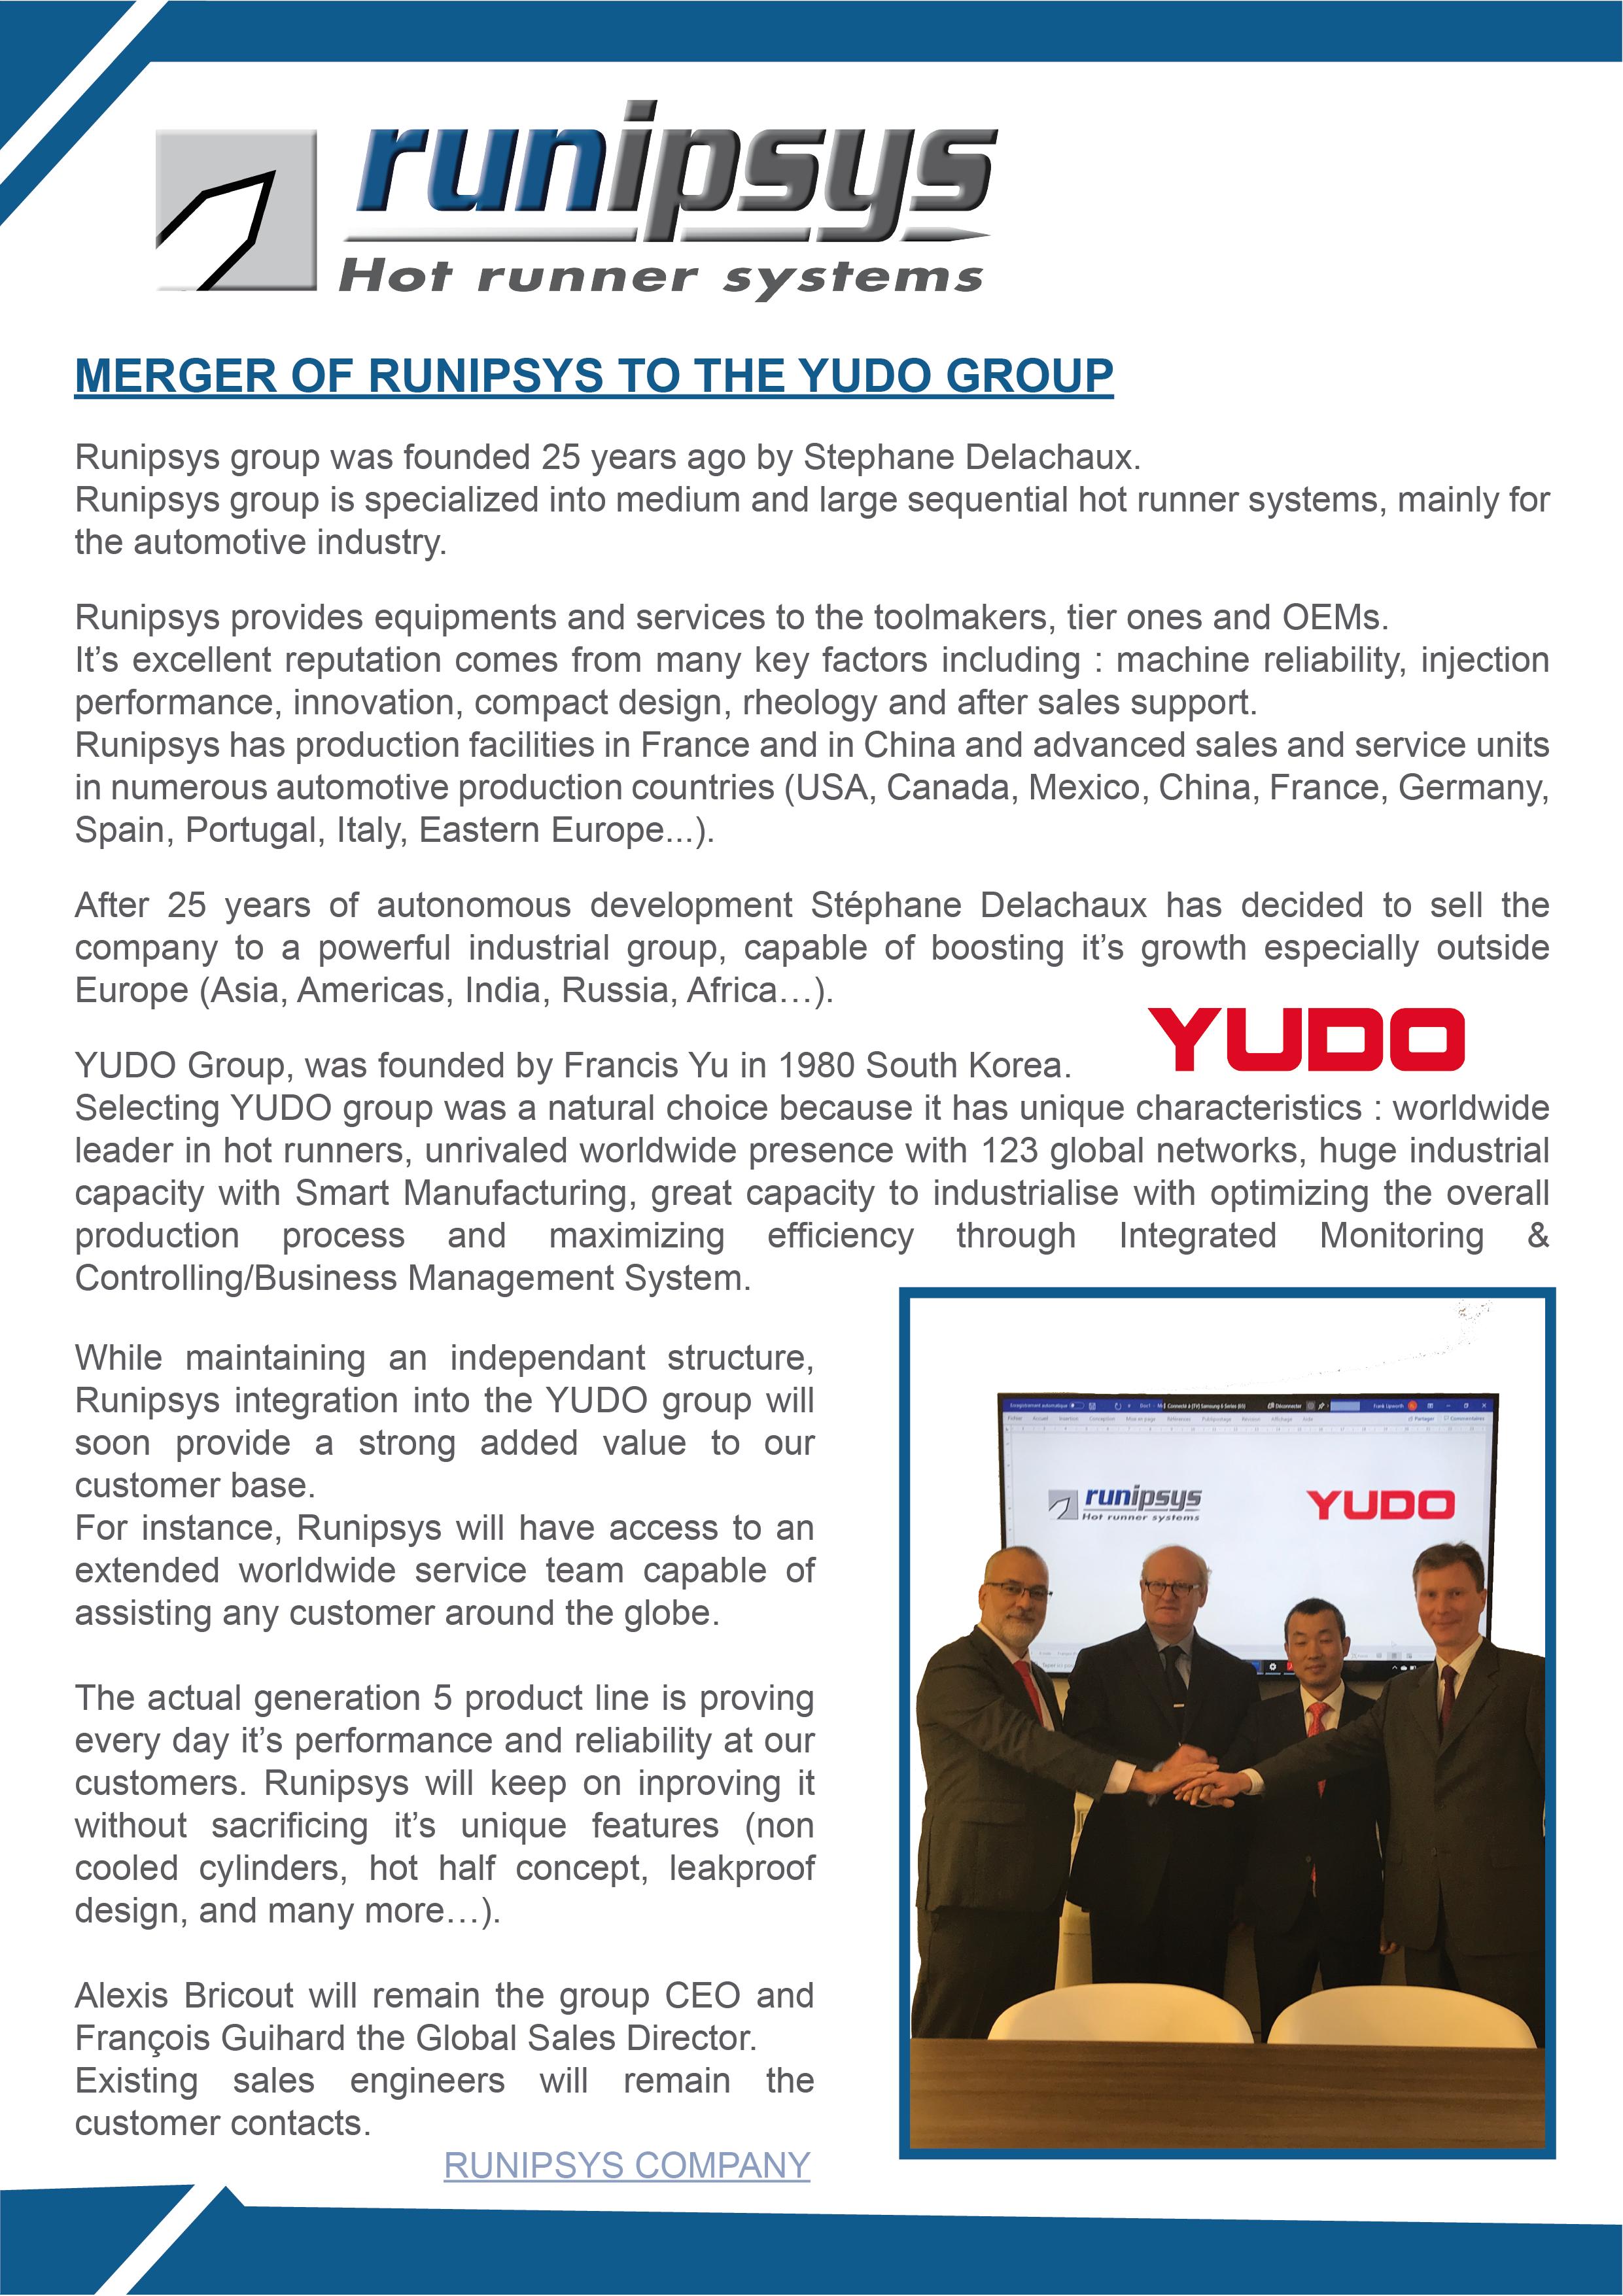 Merger of Runipsys to the YUDO group